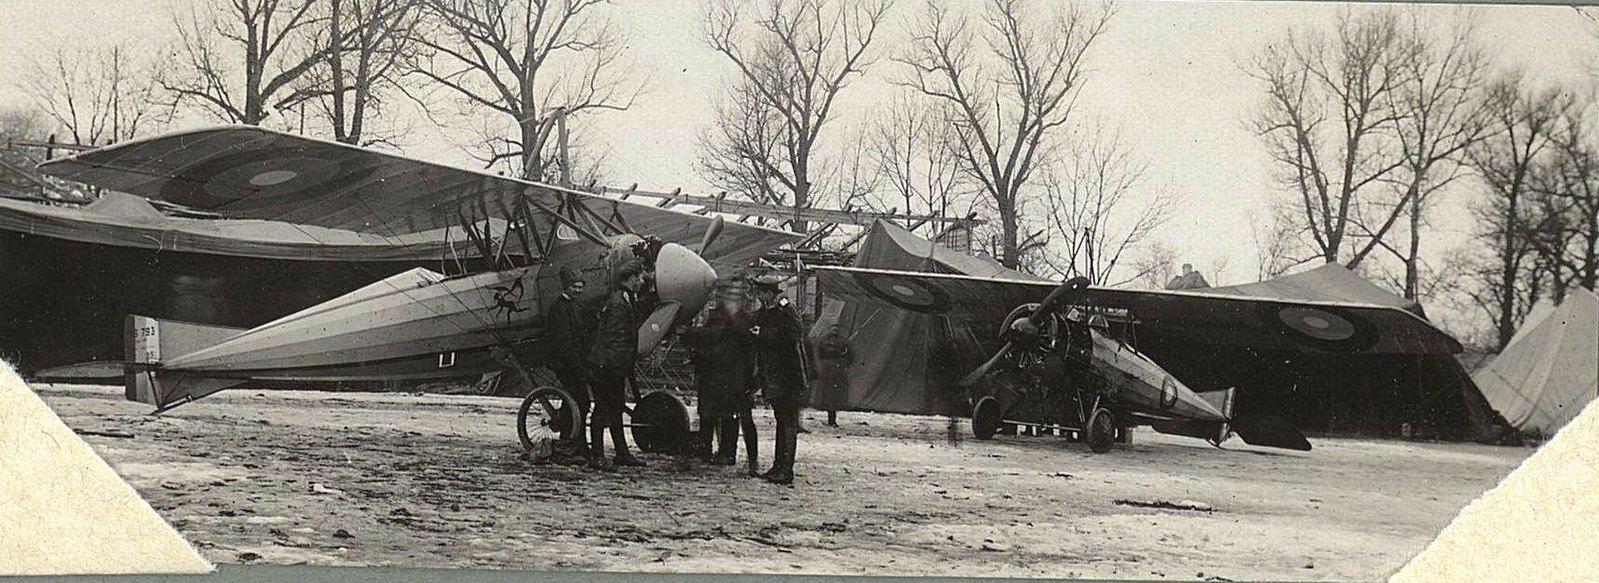 1915. Осмотр самолёта перед вылетом